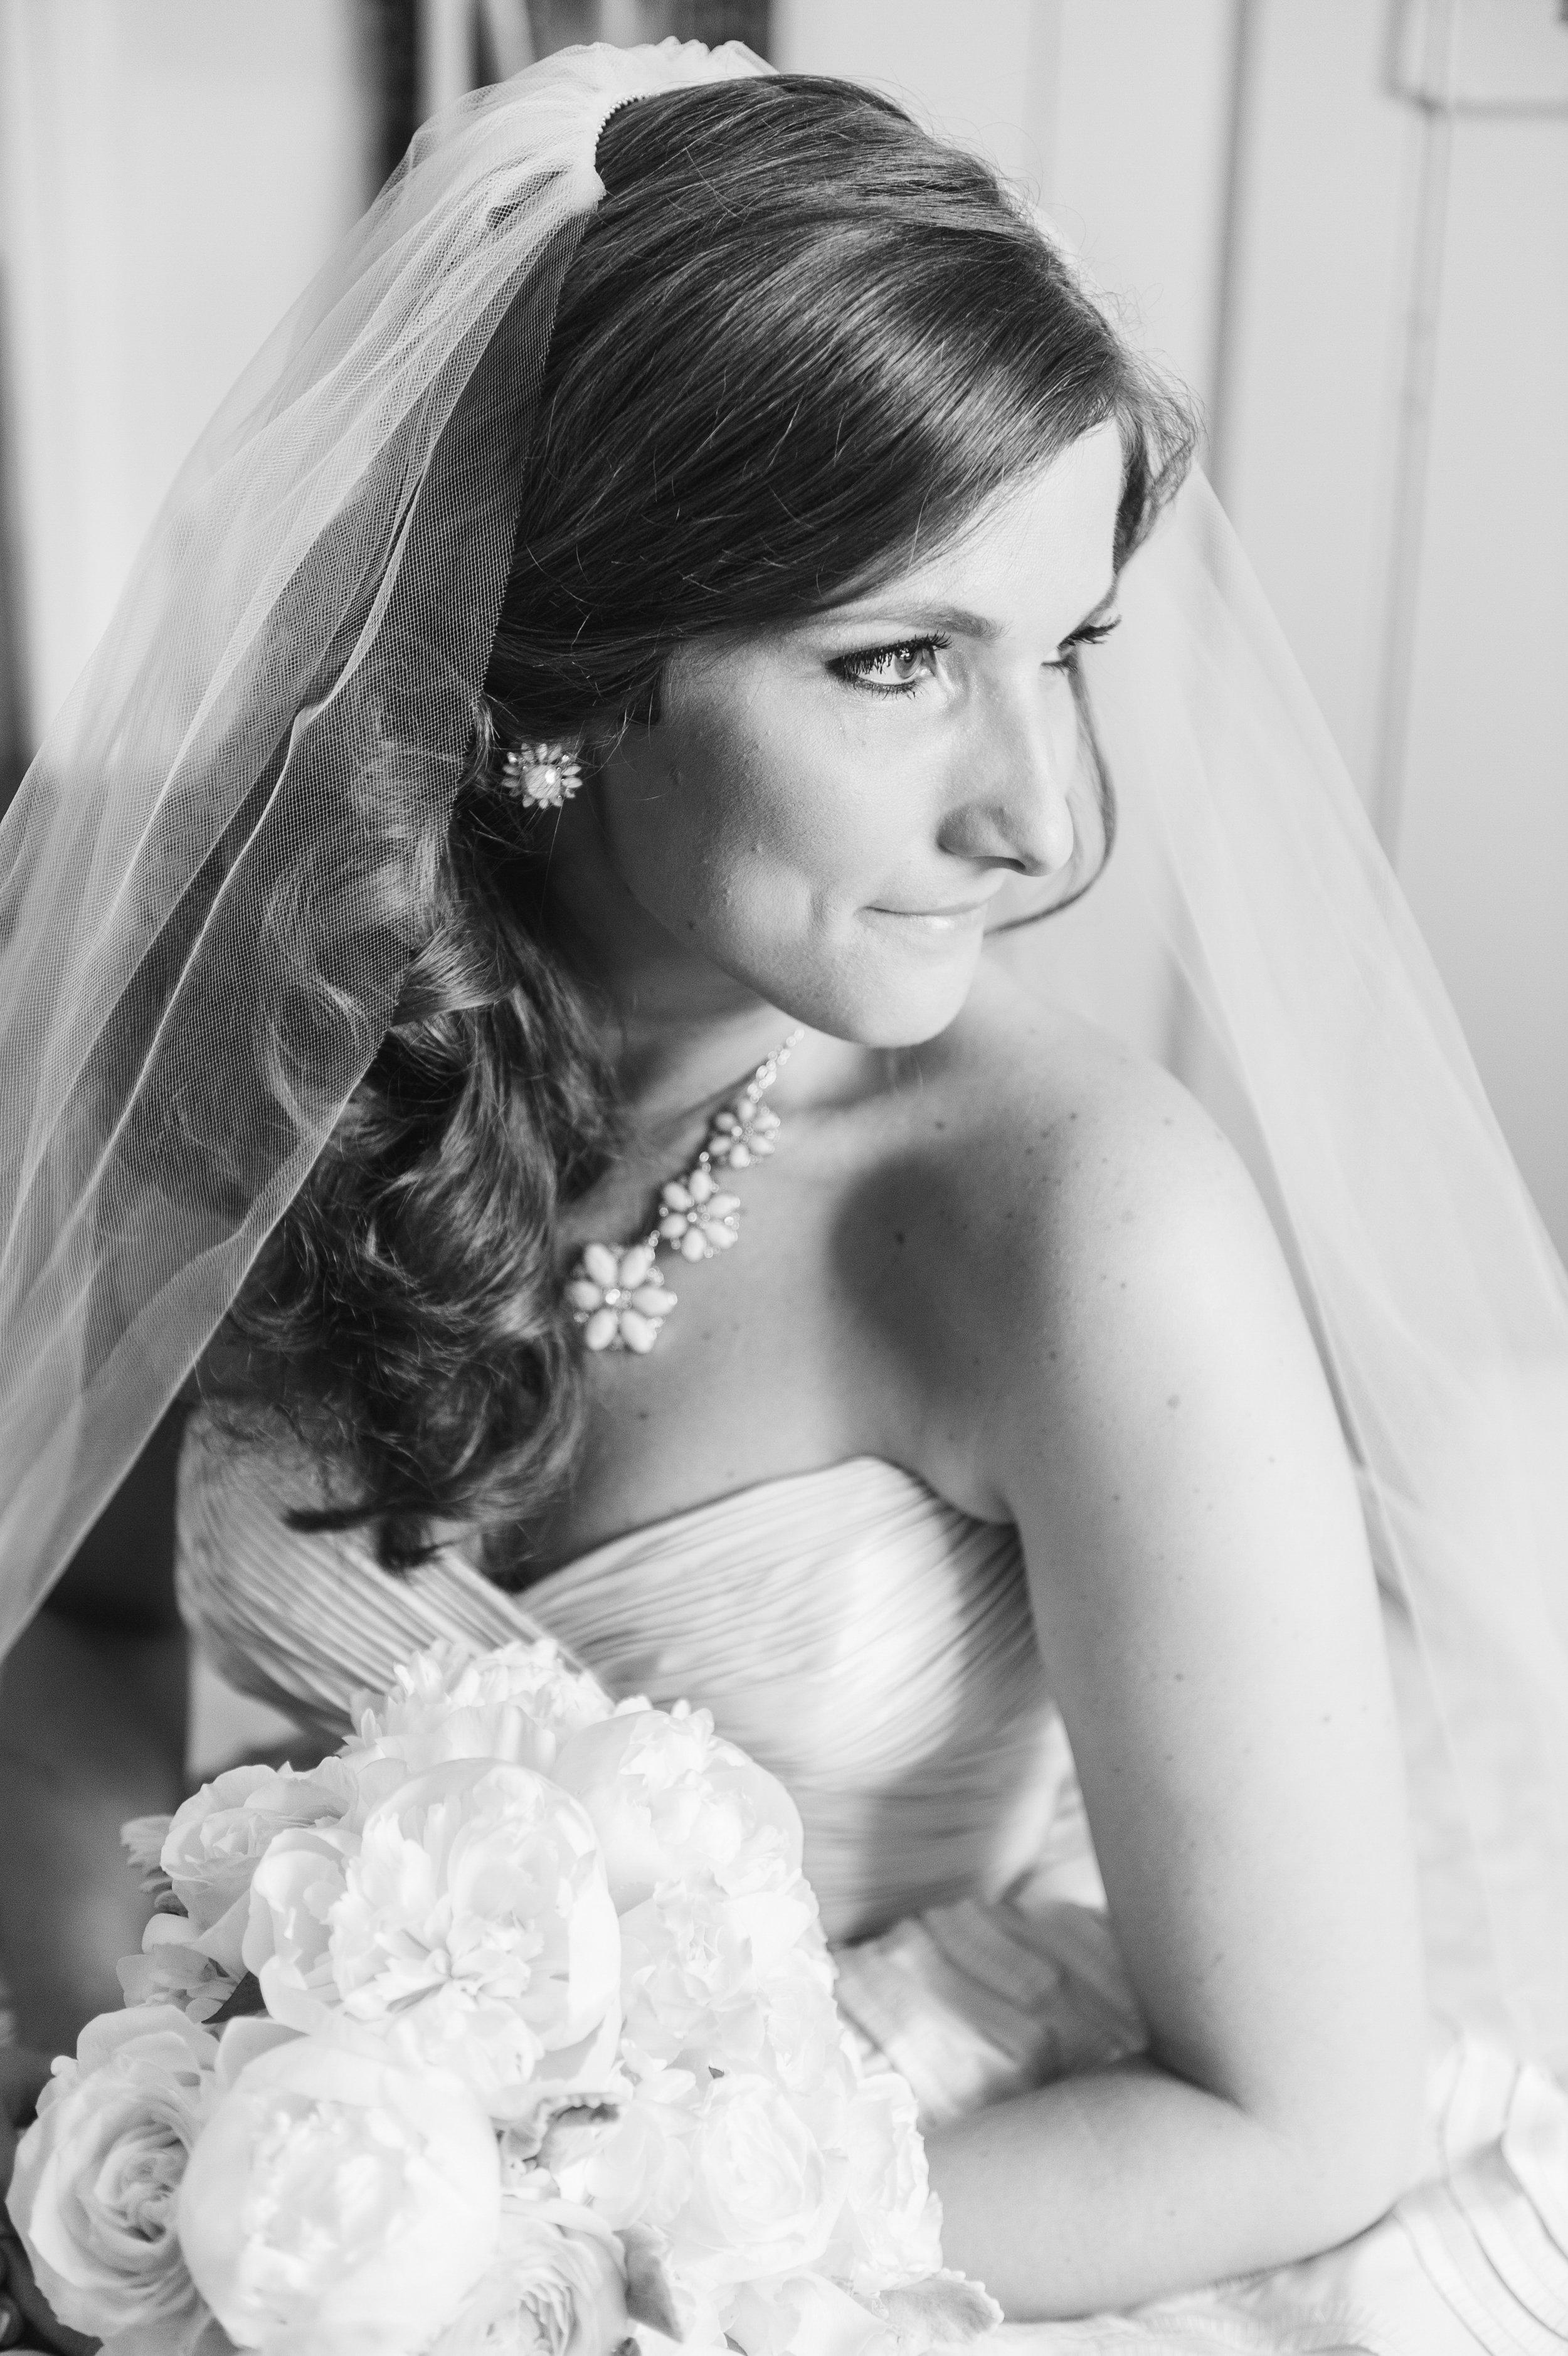 Silverbrook-Farm-Weddings-Virginia-10.jpg